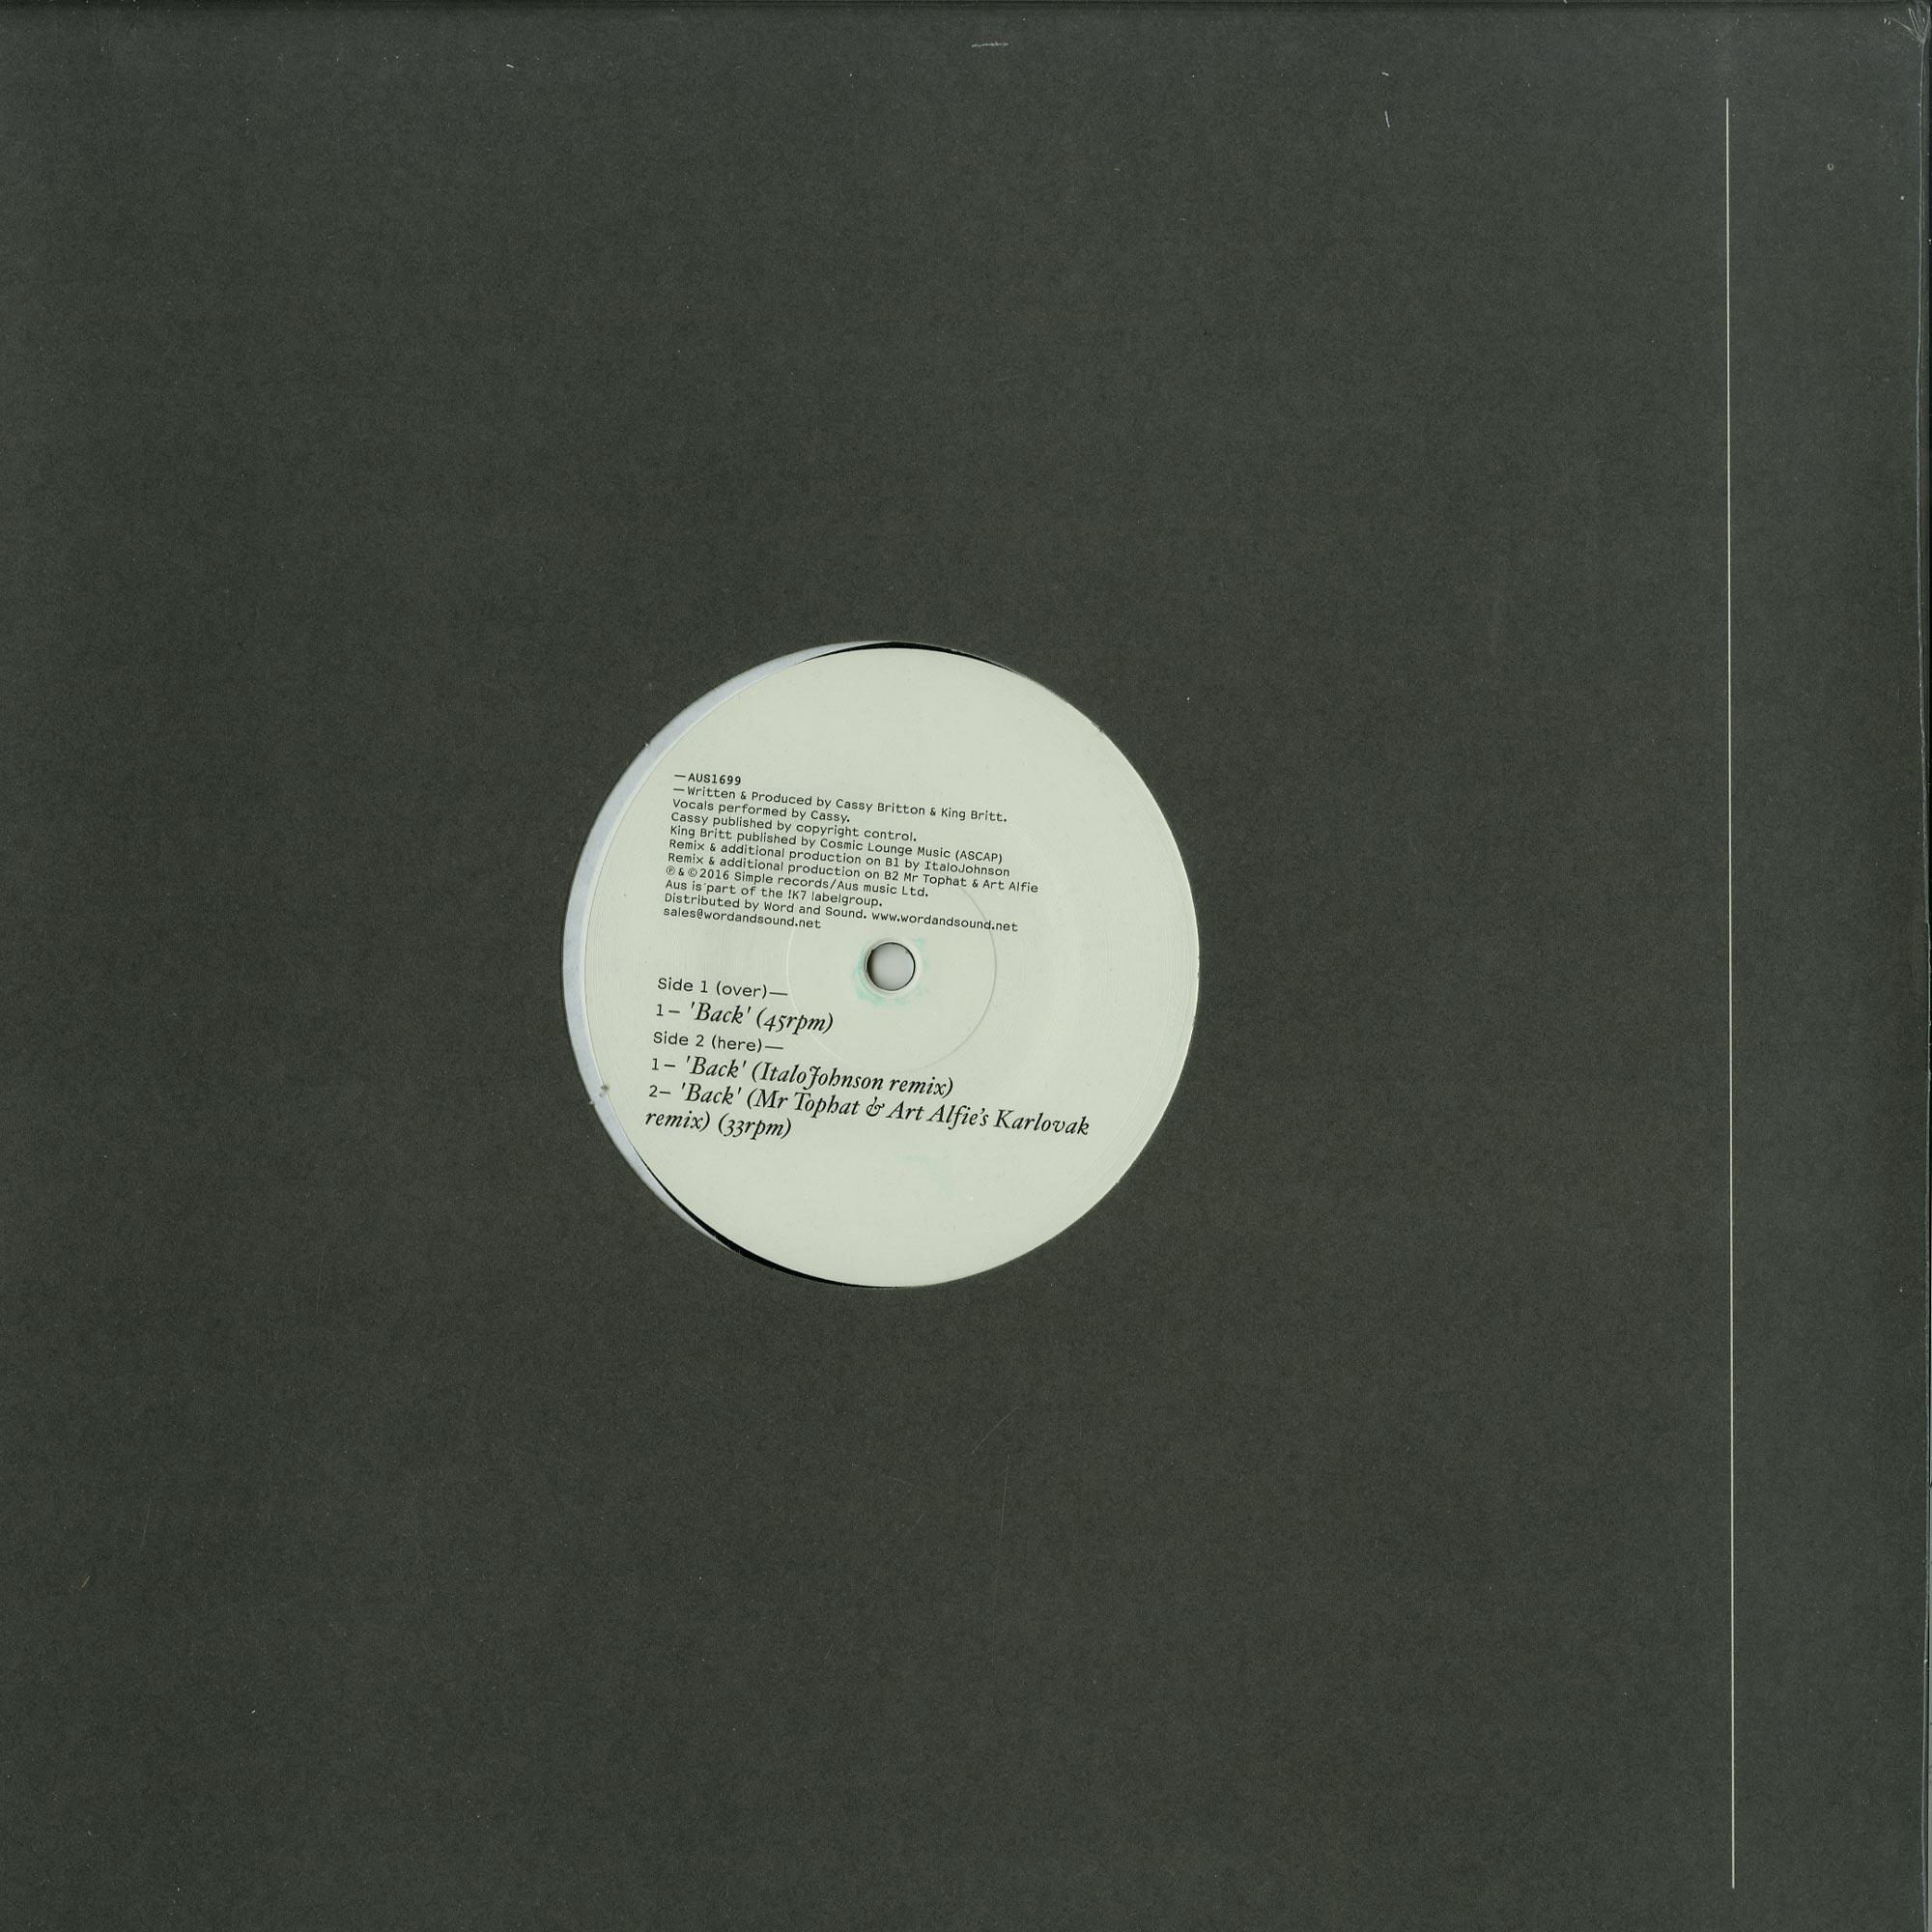 Cassy - BACK EP ITALO JOHNSON RMX MR TOP HAT ART ALFIES KARLOVAK REMIX